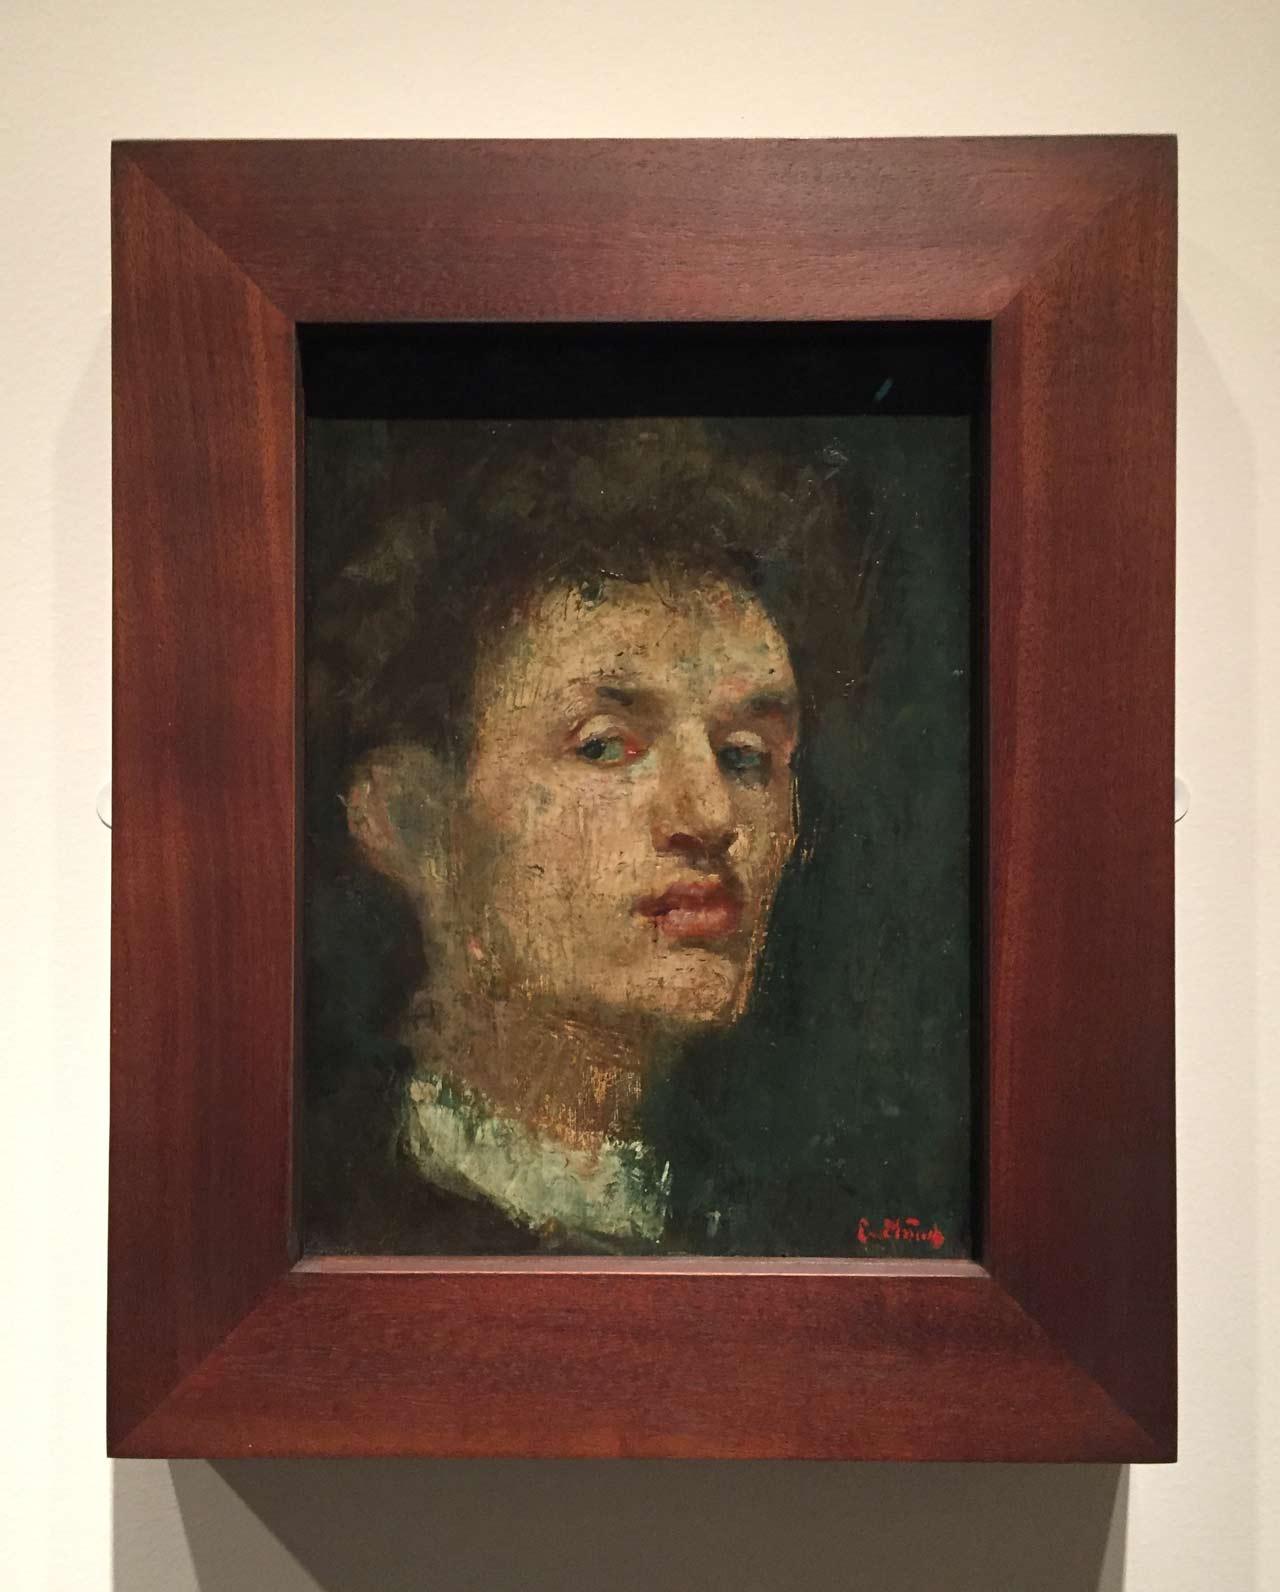 Edvard-Munch-Self-Portrait-1886-National-Museum-Art-Oslo.jpg